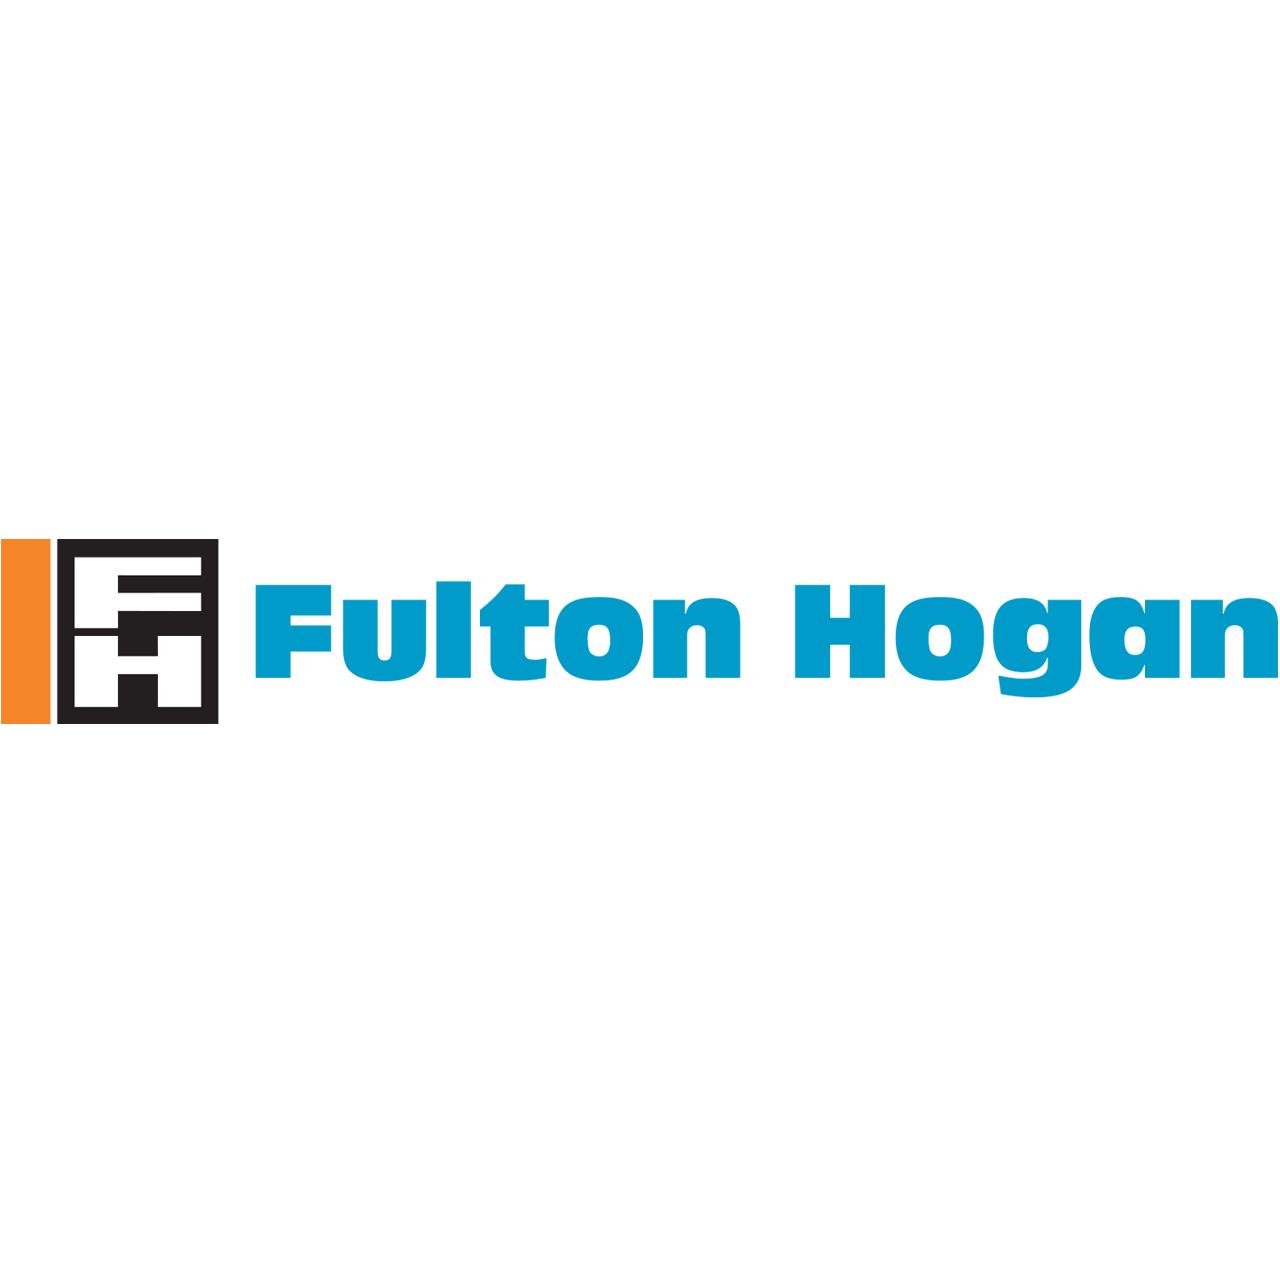 Fulton Hogan Utilities